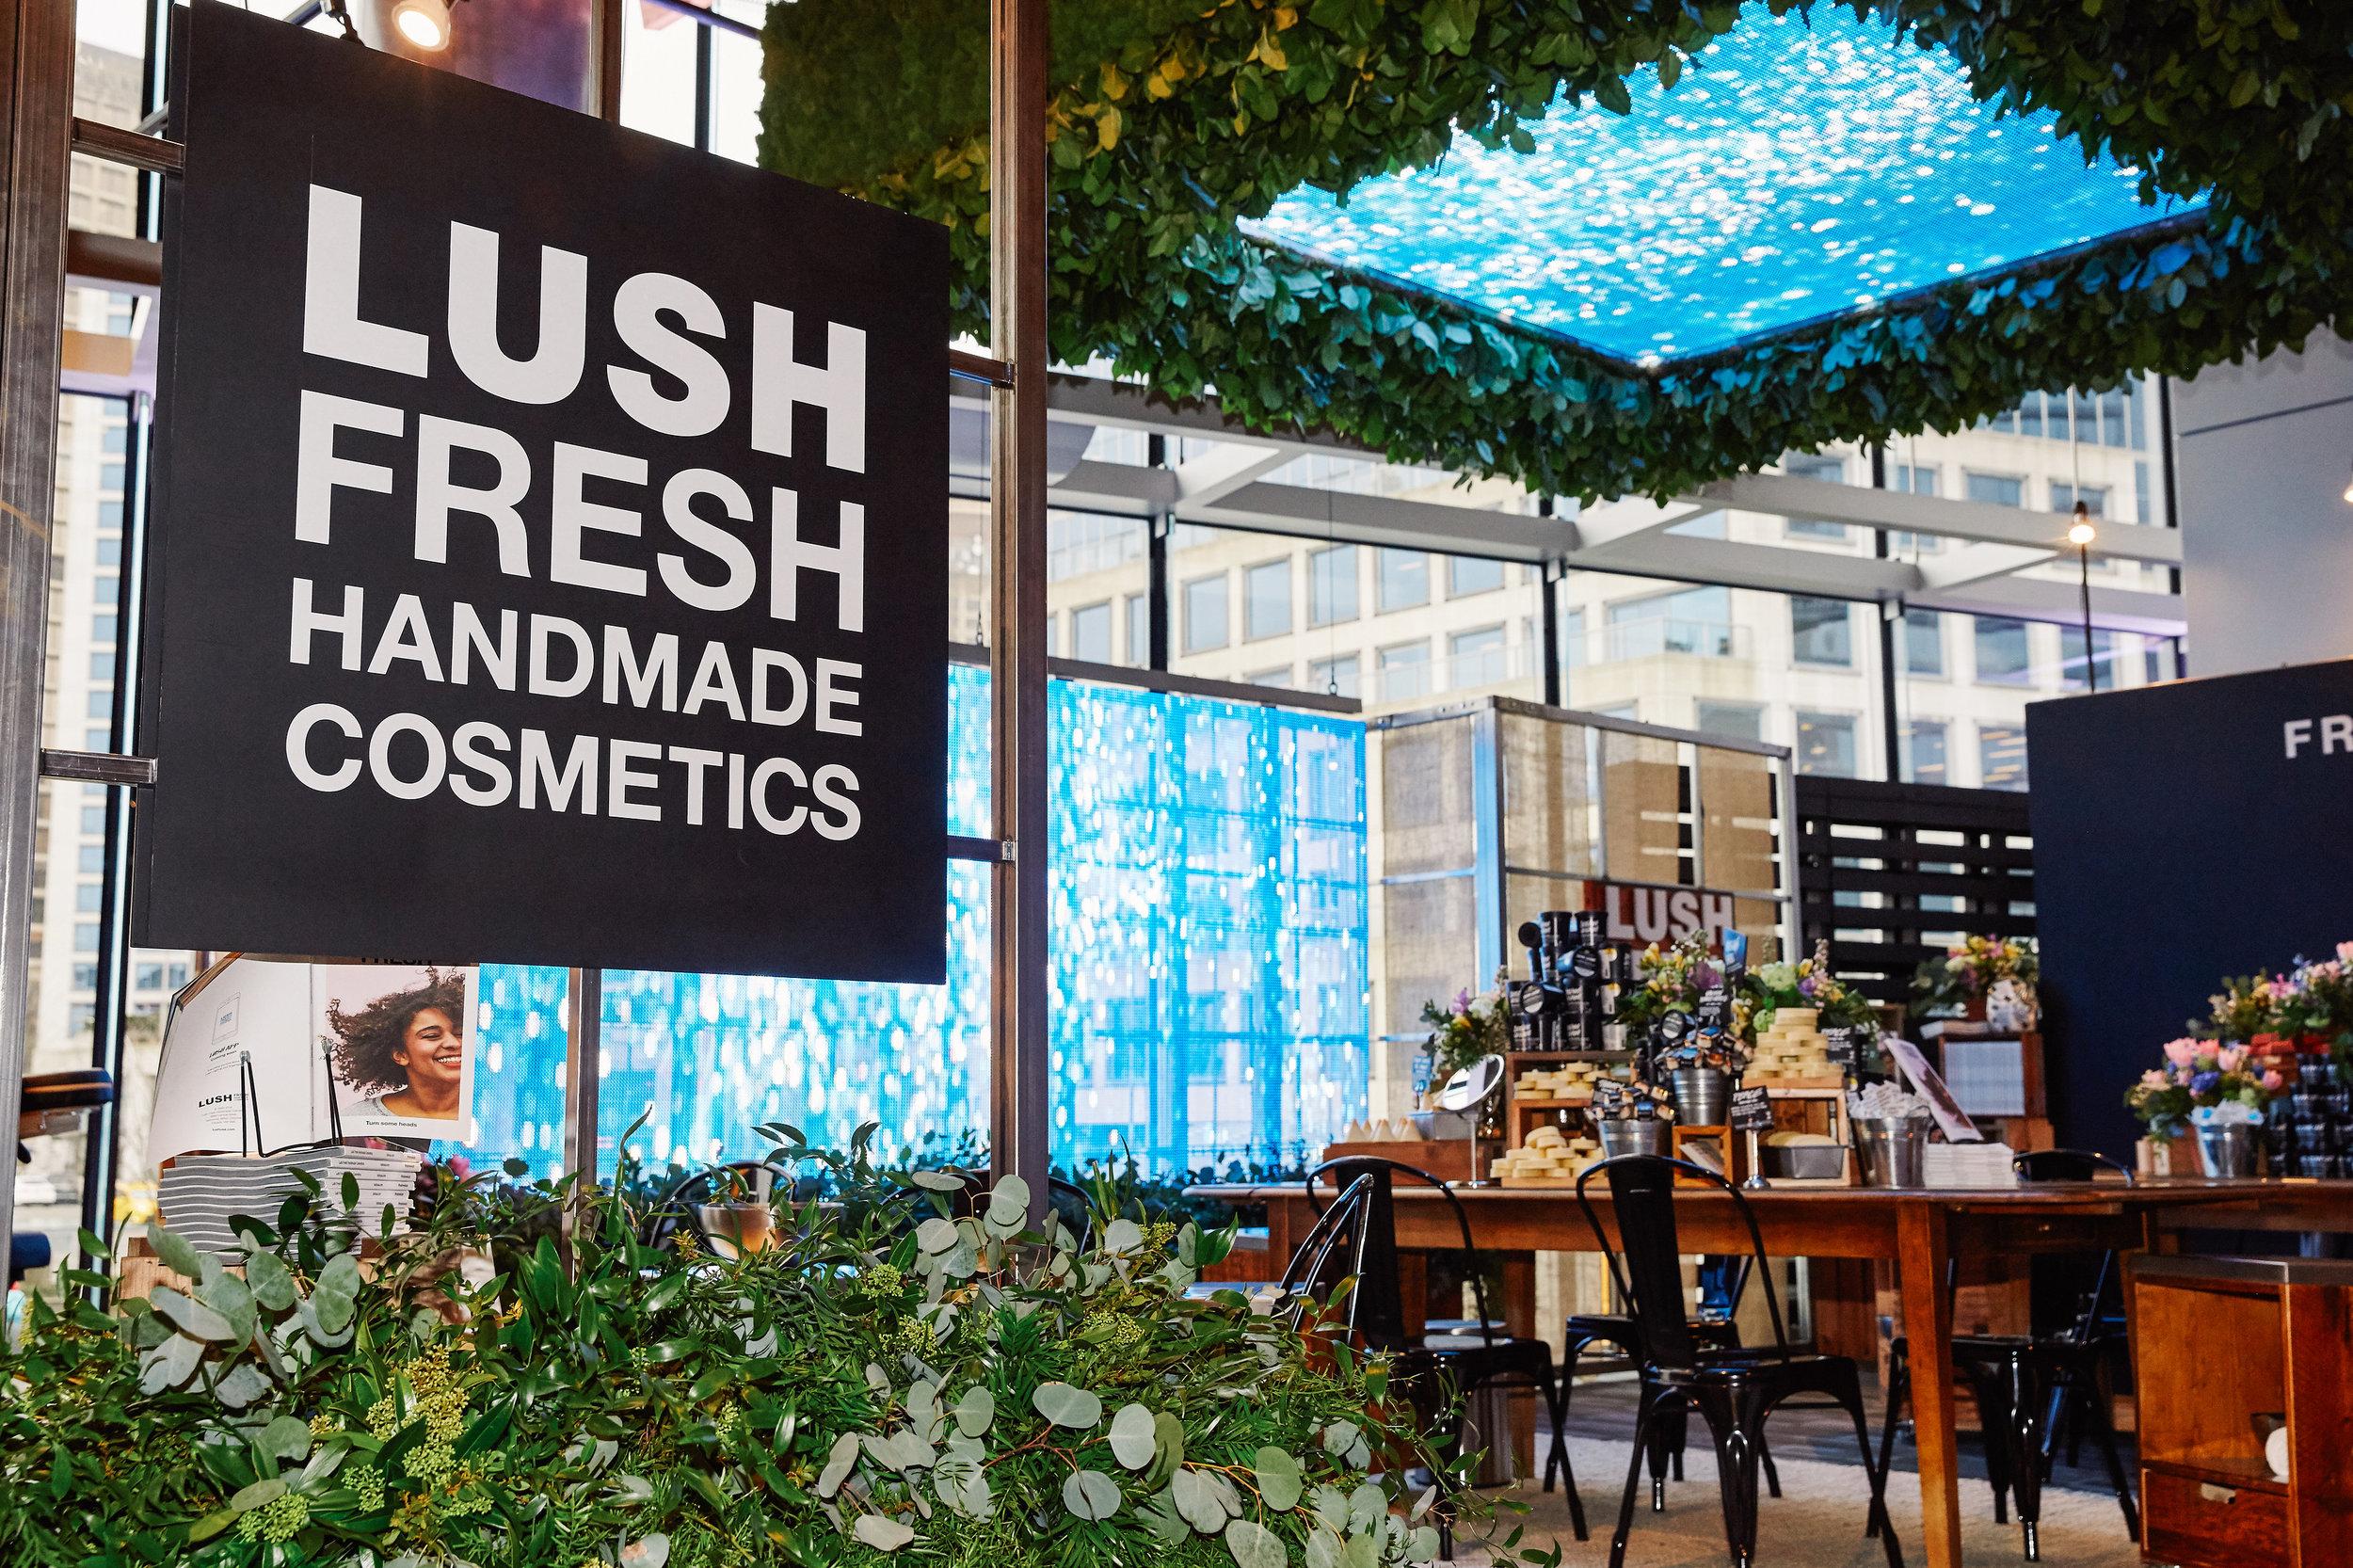 TED x Lush Cosmetics, 2016. Photo credit: Lush Cosmetics